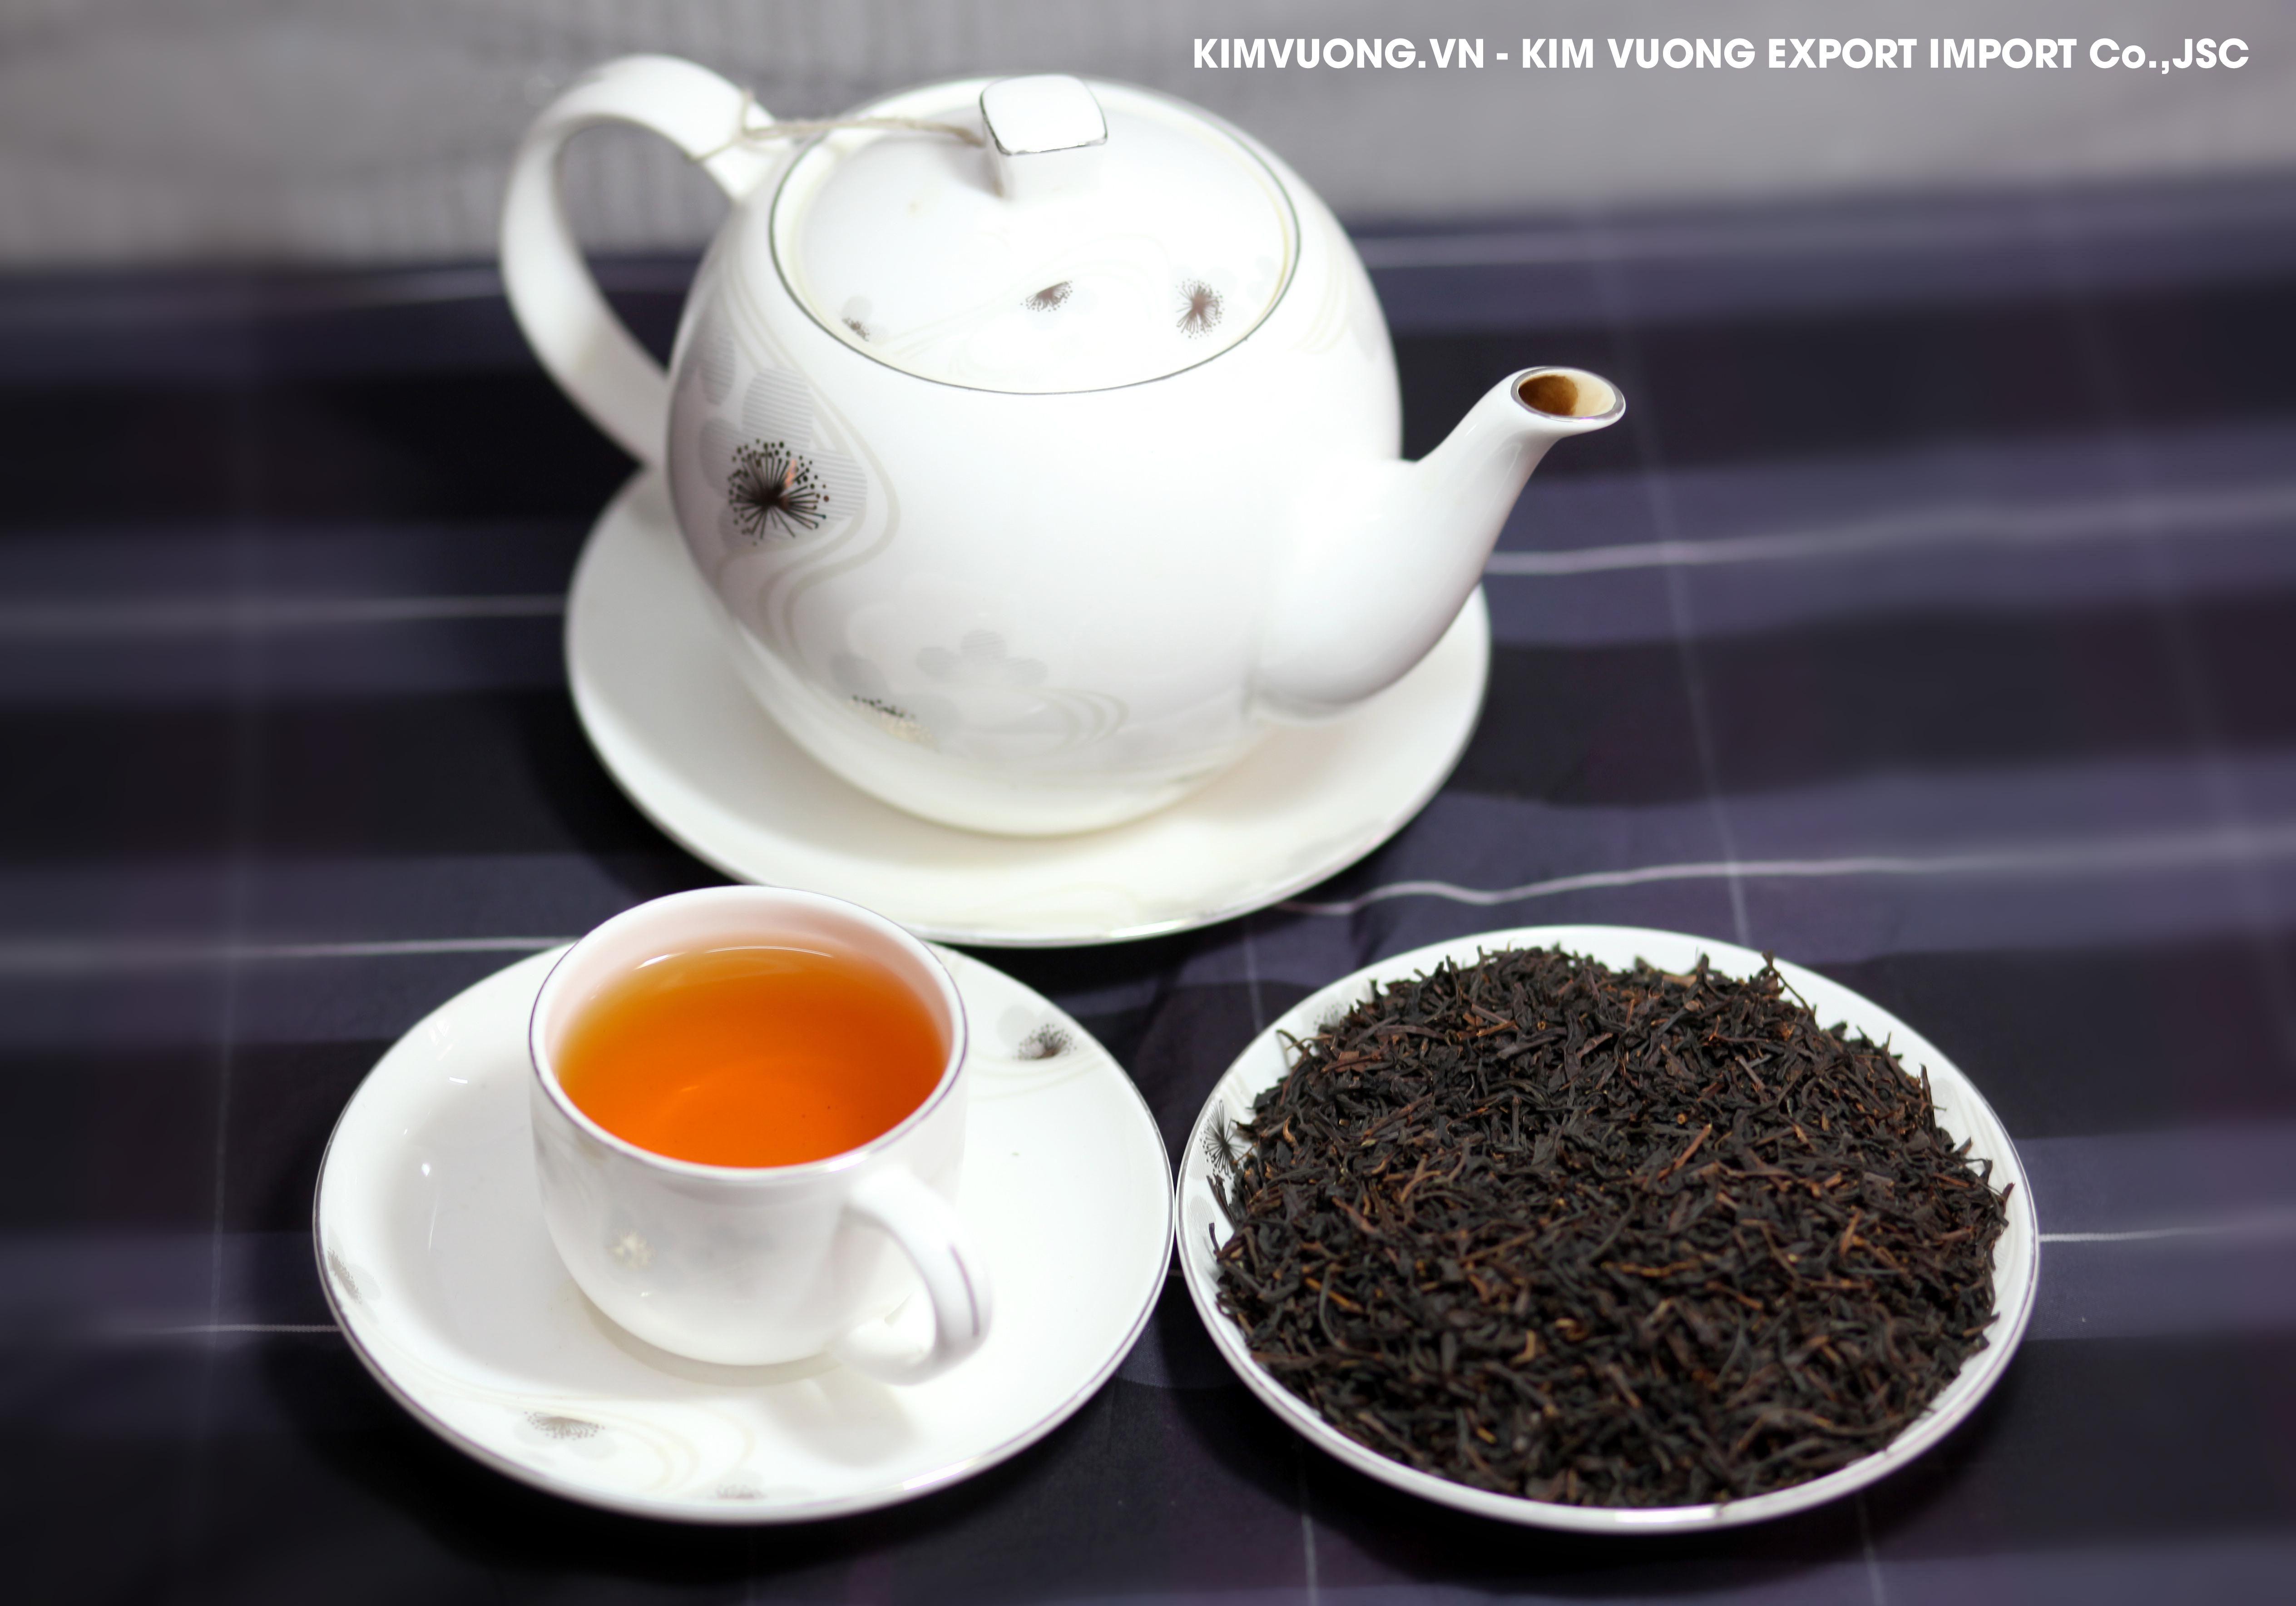 Black tea OP  - KIM VUONG EXPORT IMPORT Co.,JSC